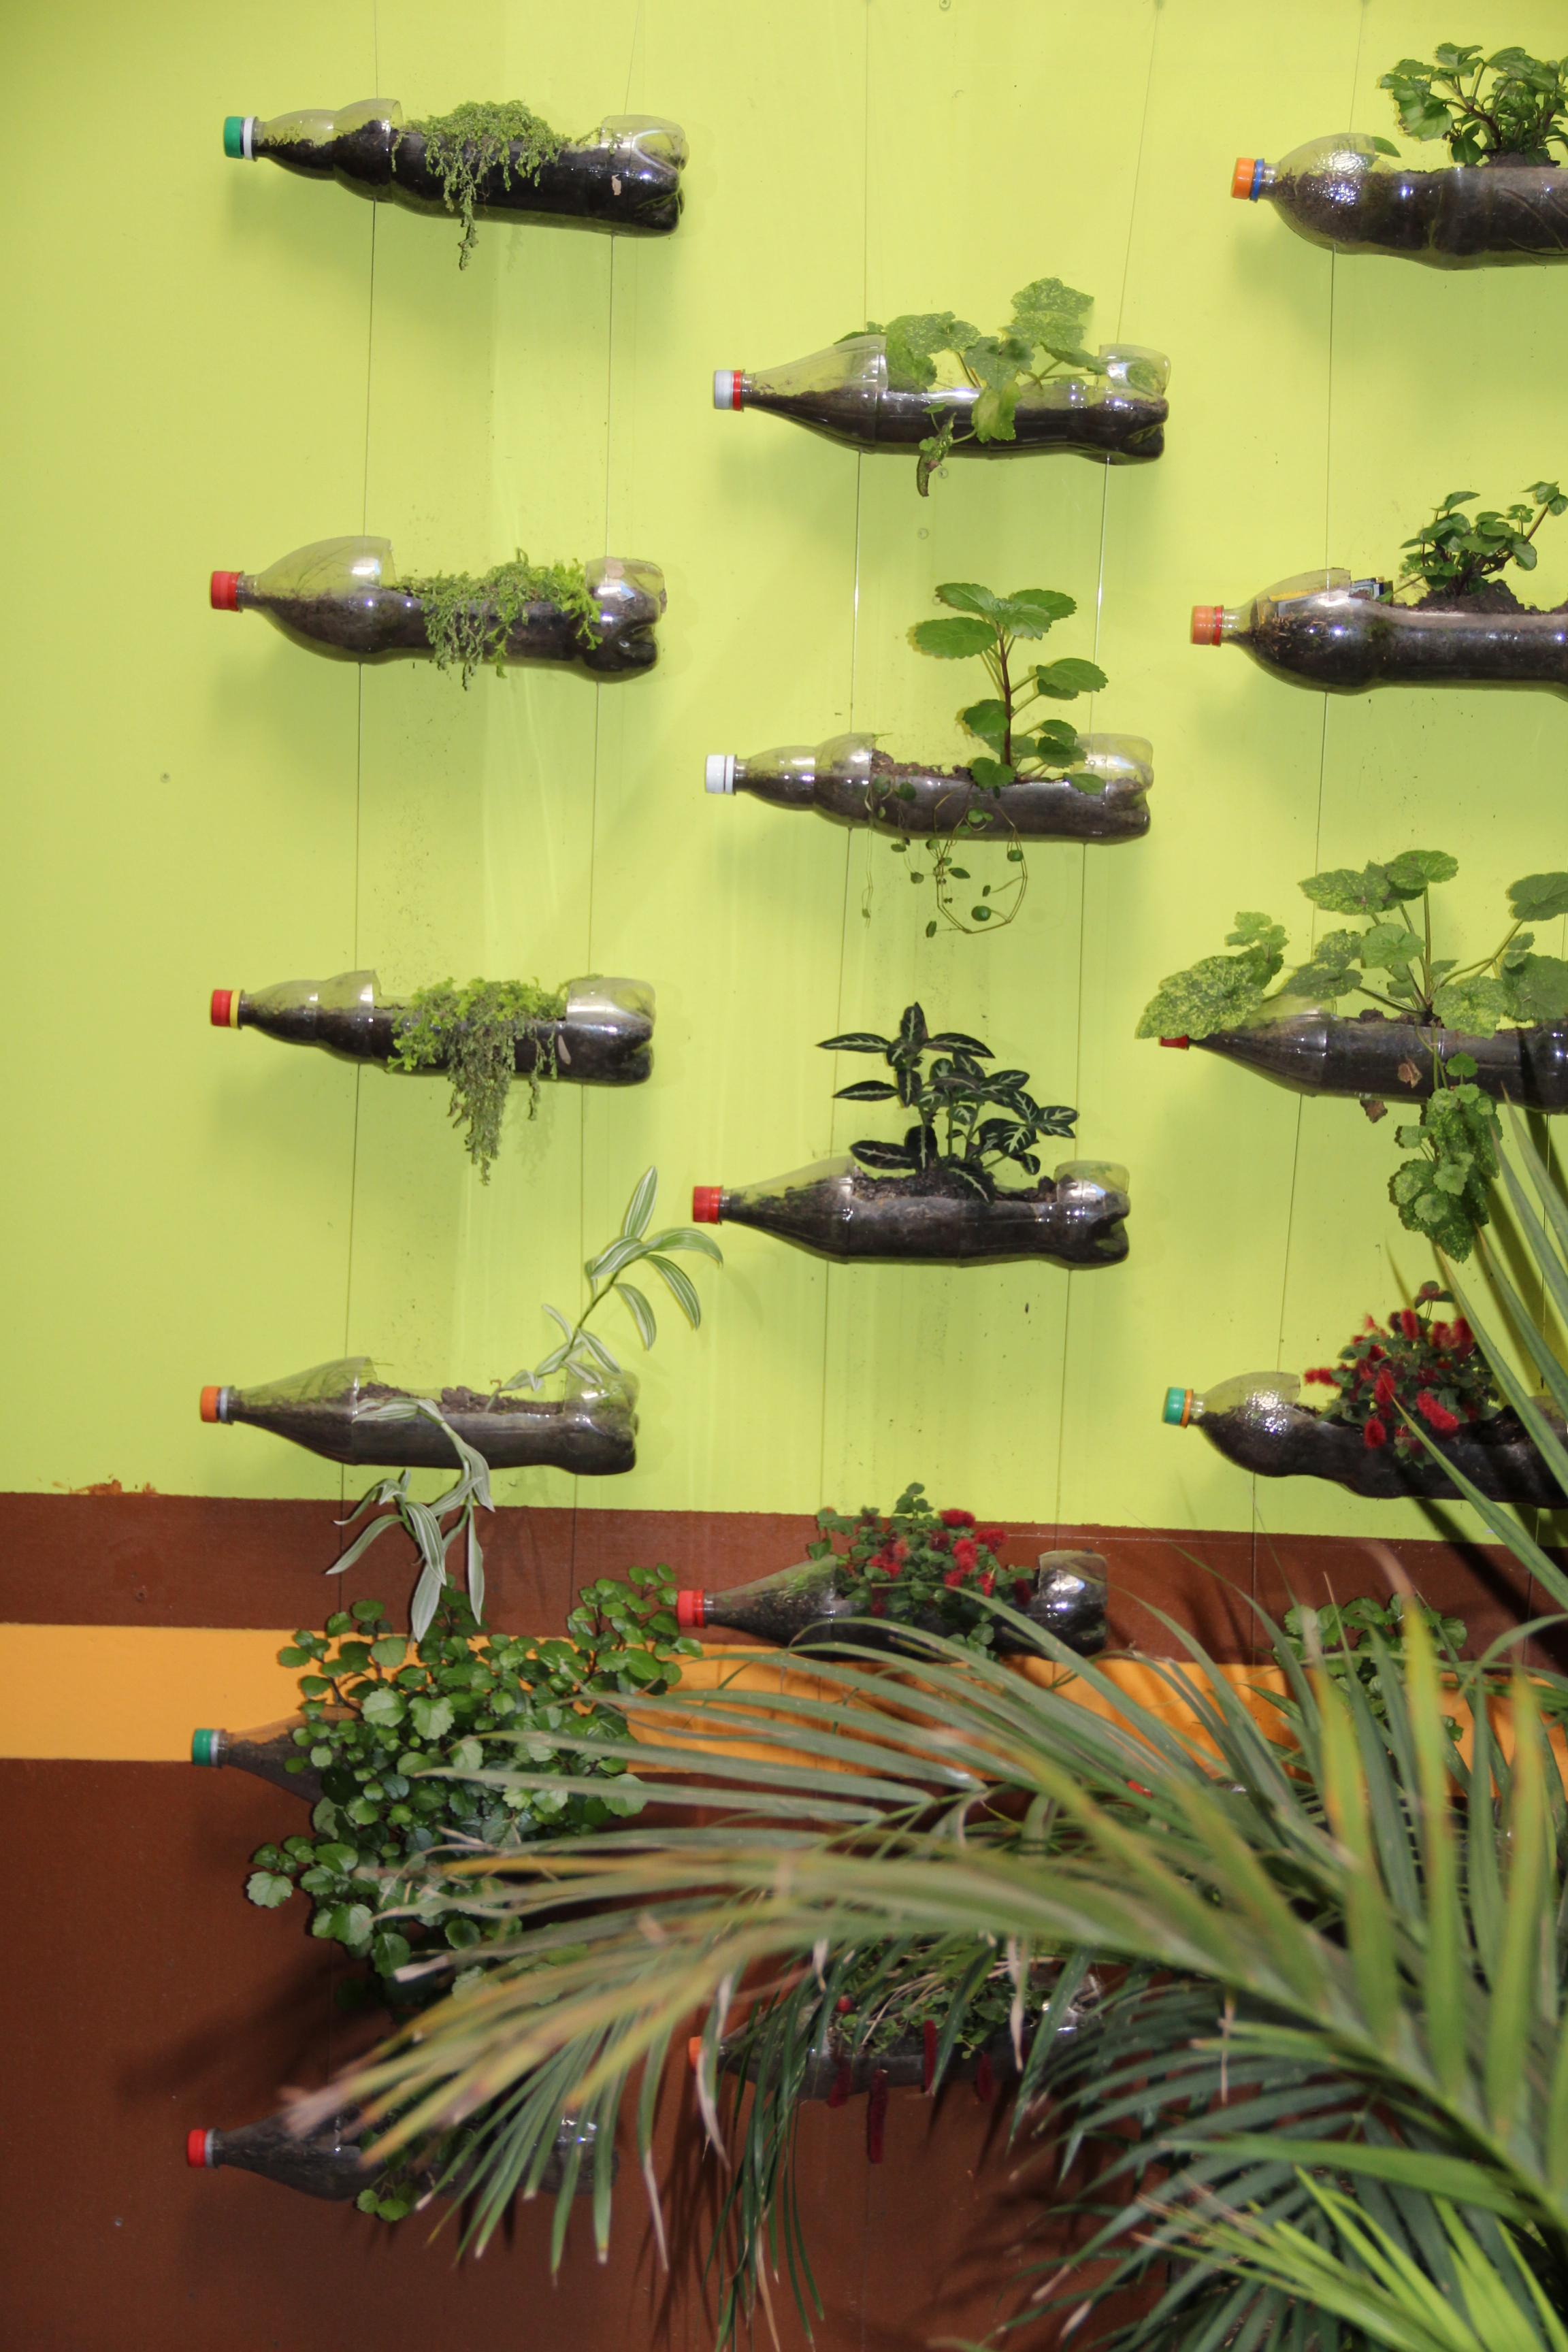 Jardines verticales abc del finkero for Materiales para jardines verticales